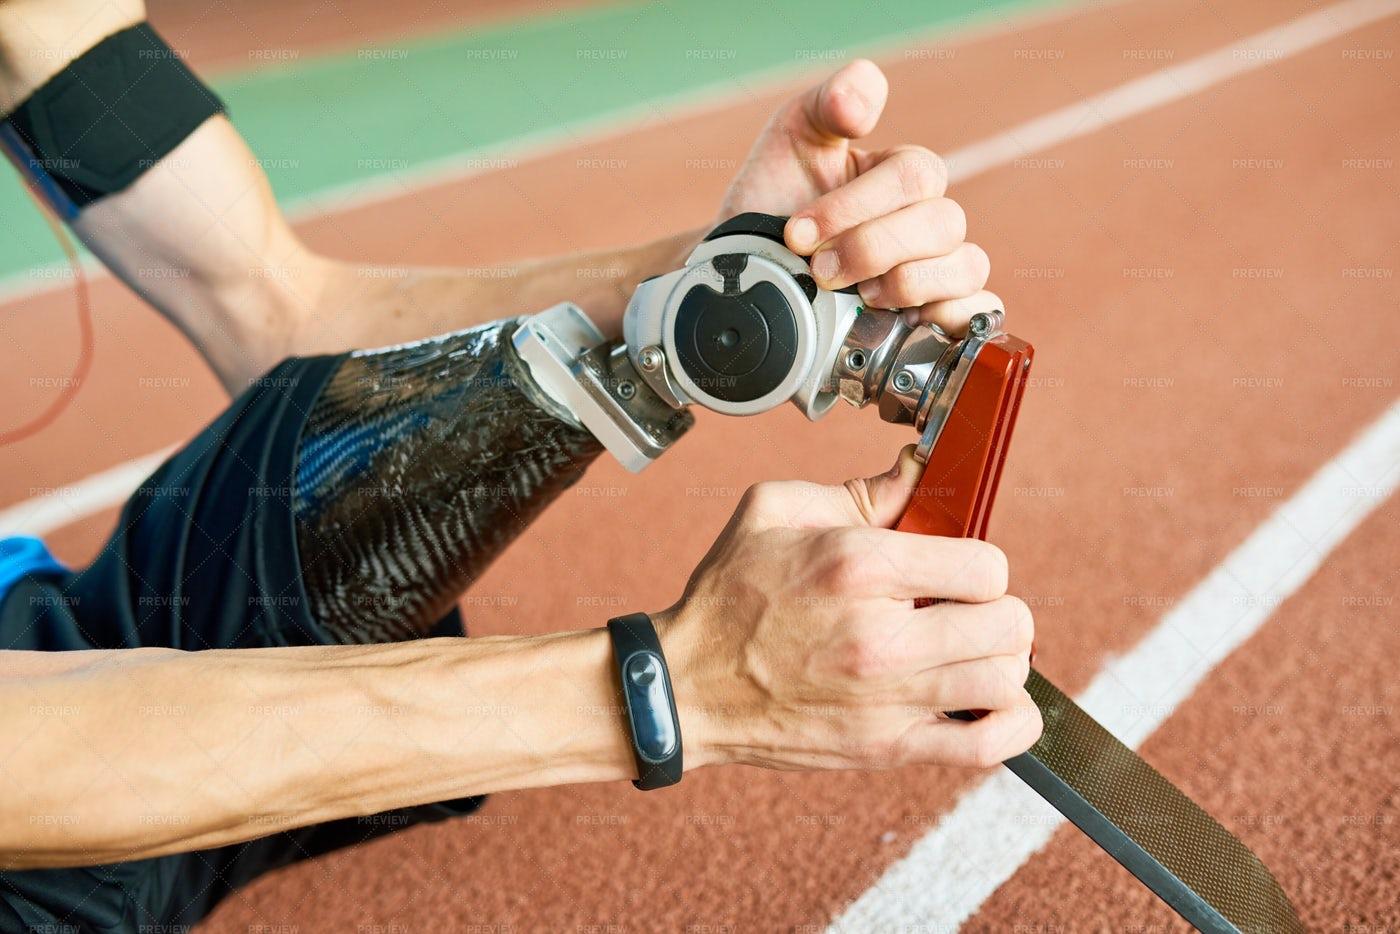 Disabled Sportsman Fixing...: Stock Photos